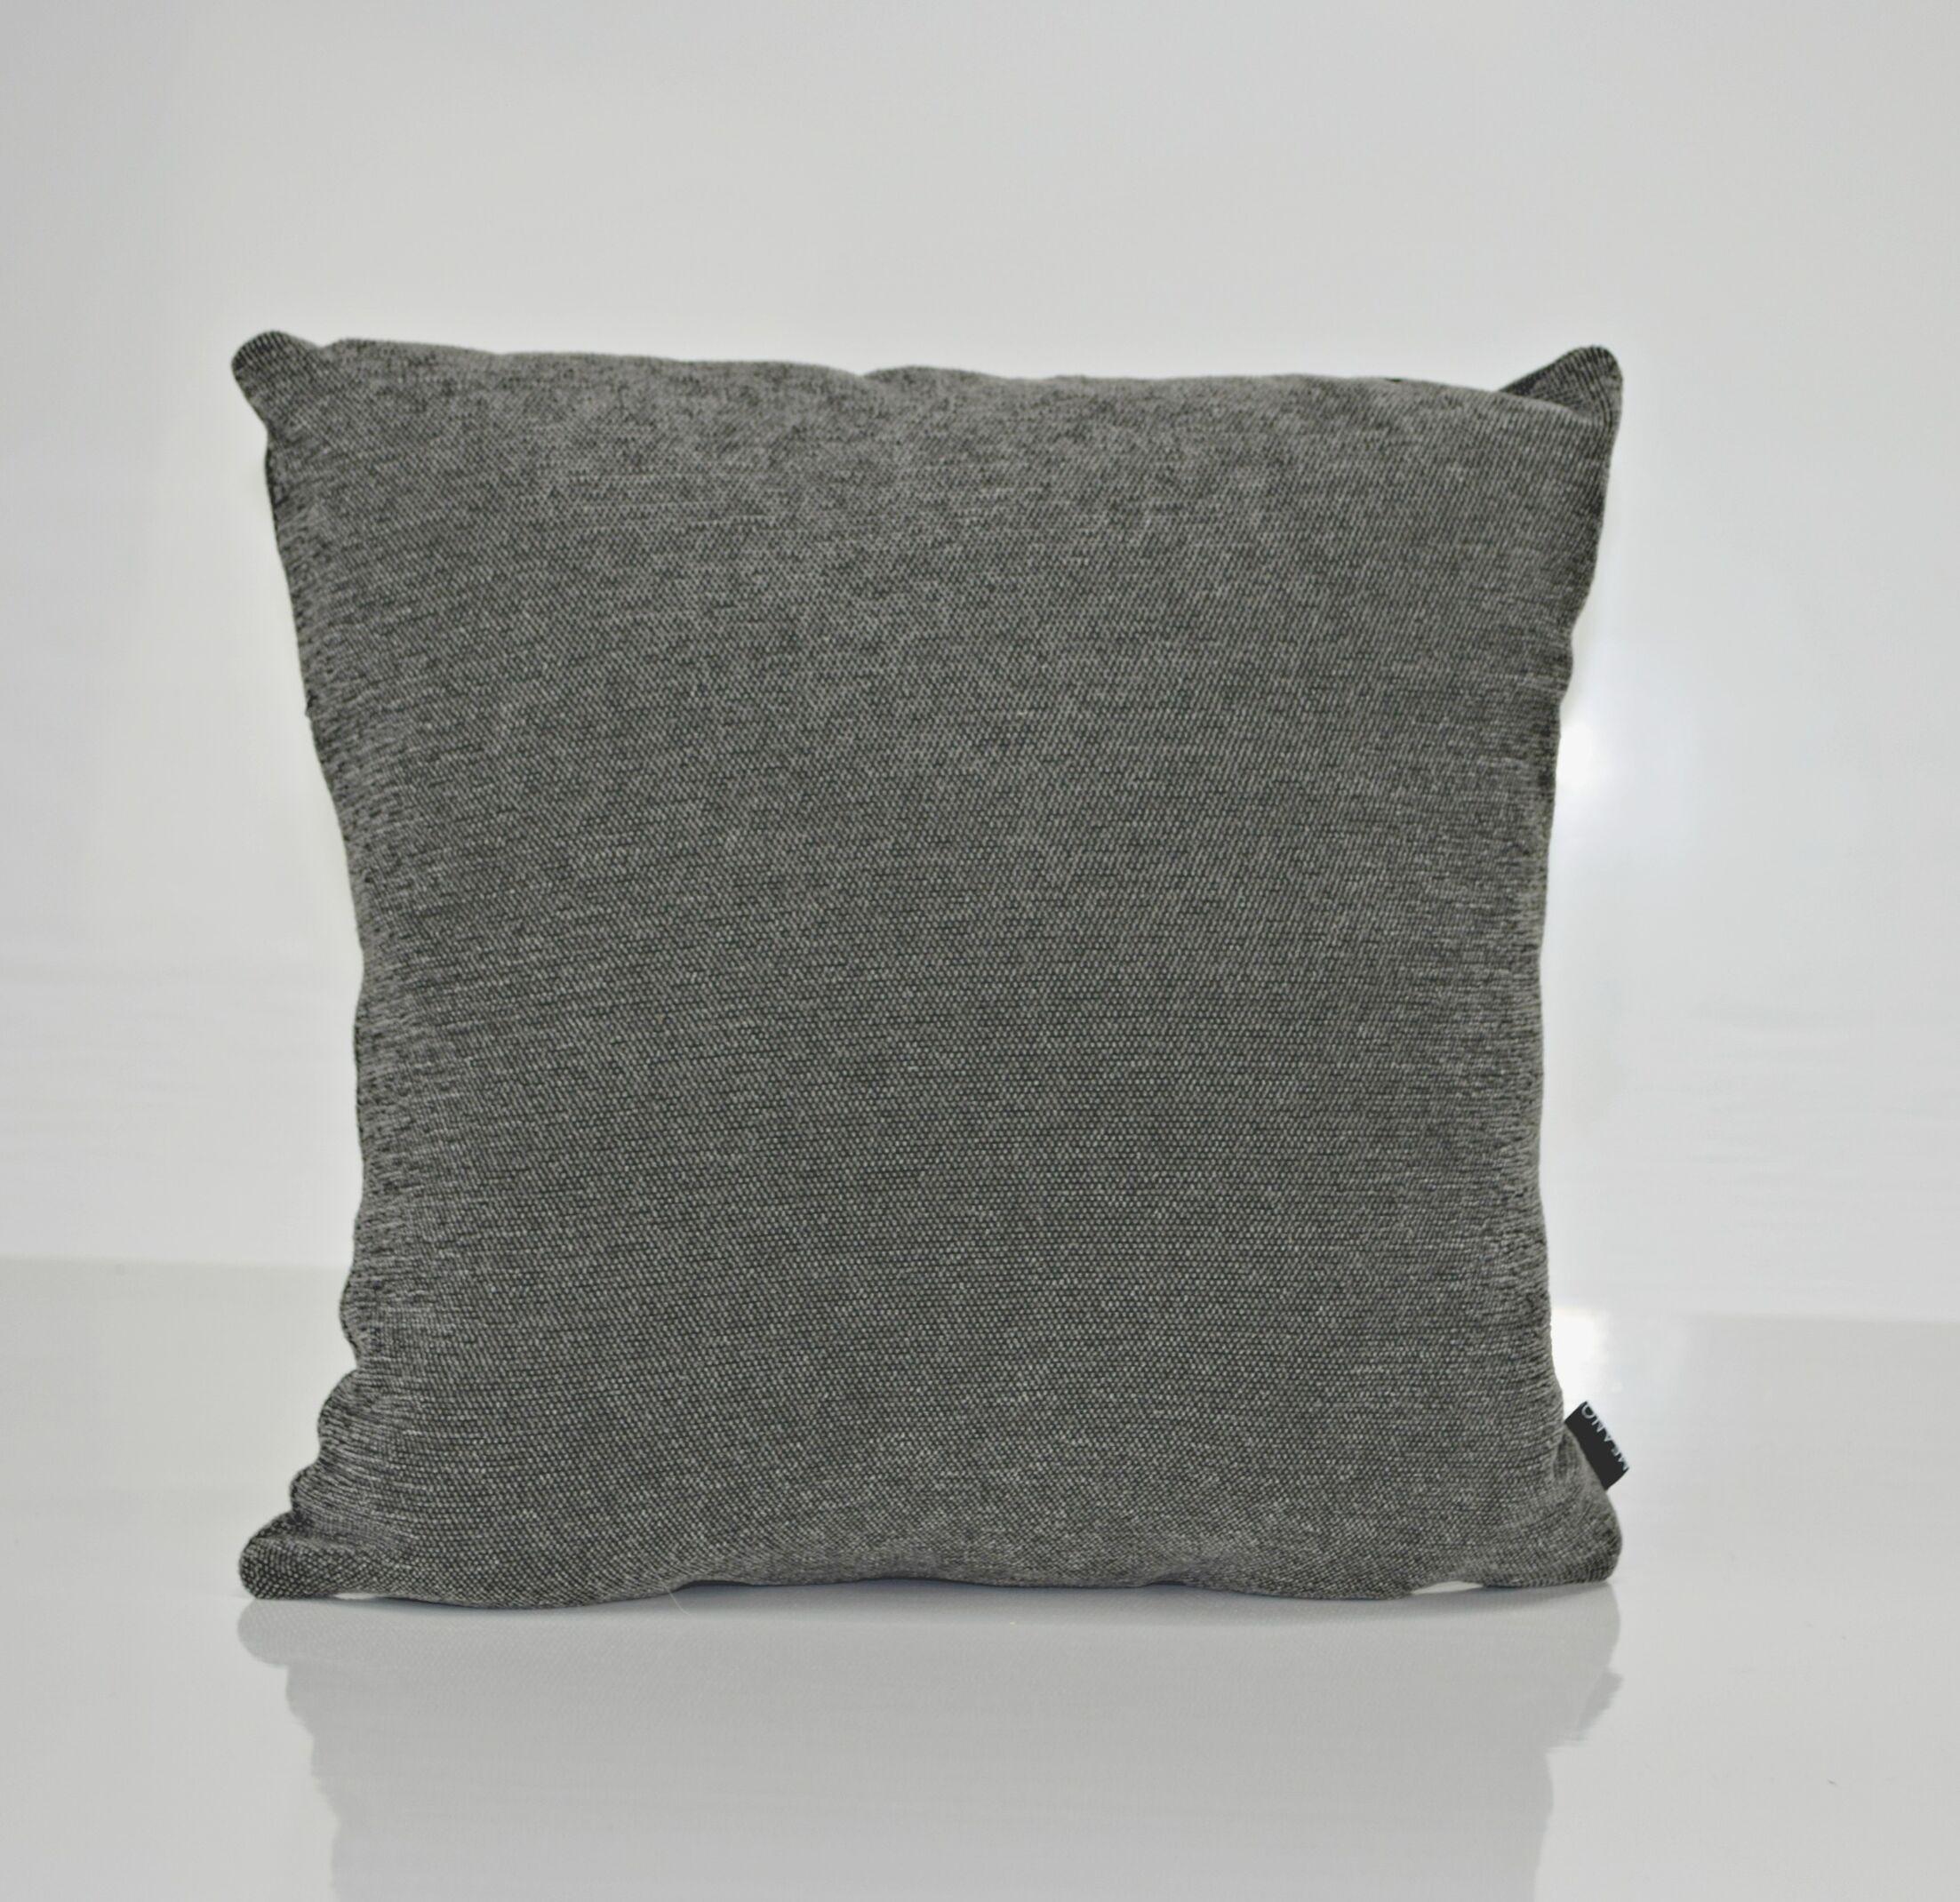 Maxey Sunbrella Indoor/Outdoor Throw Pillow